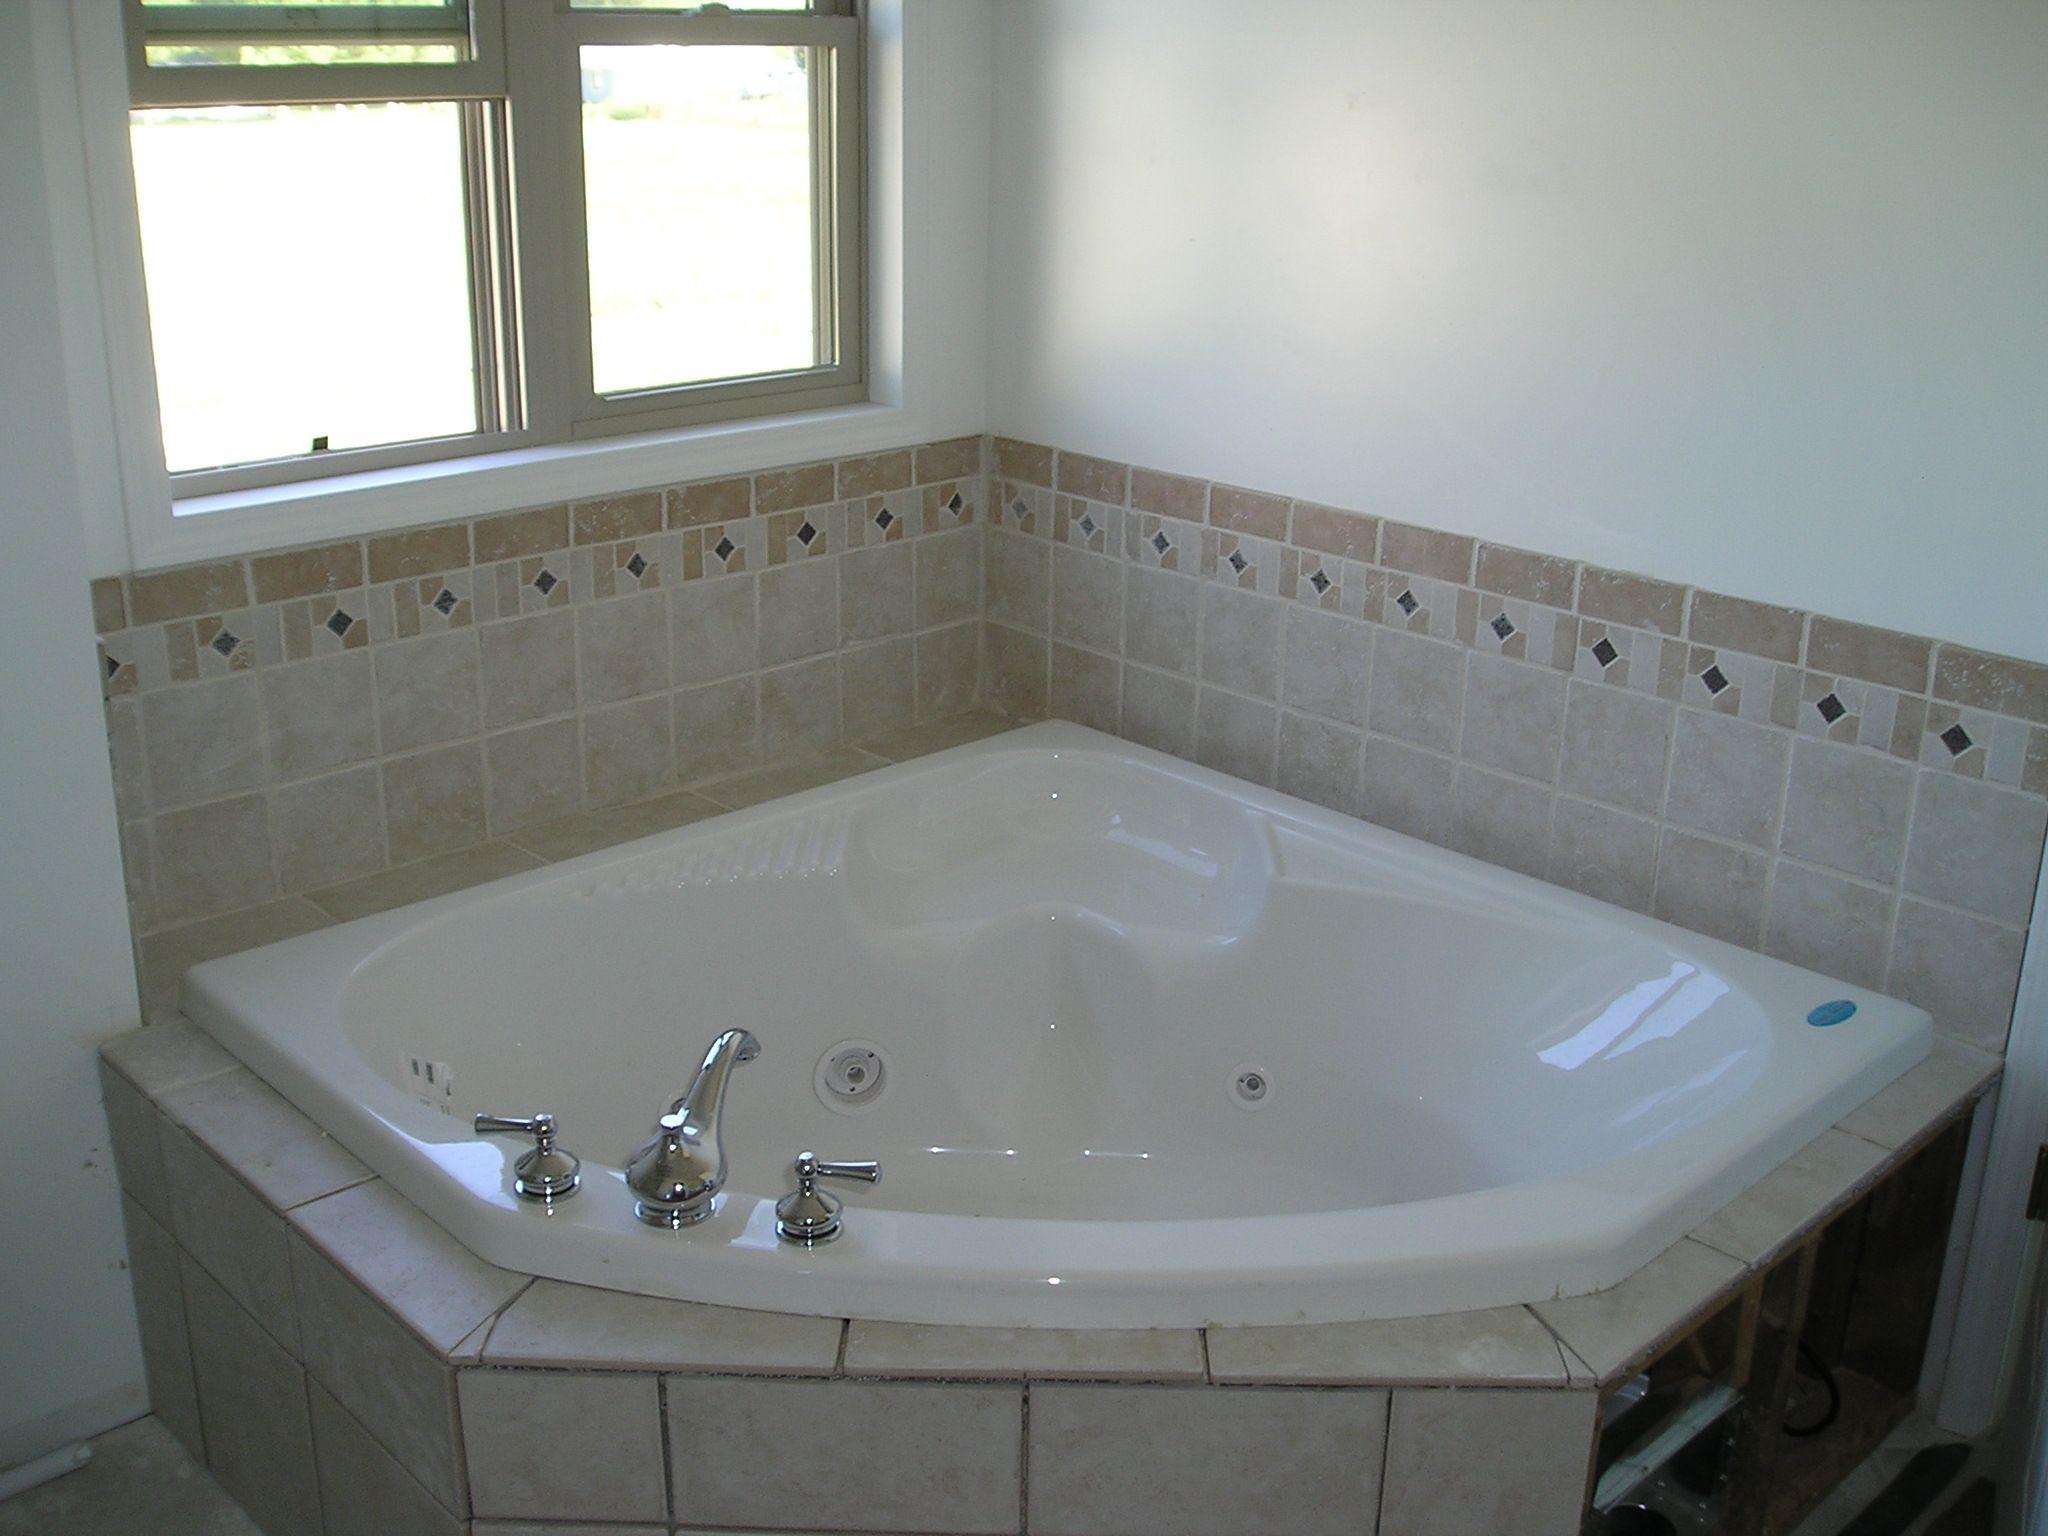 Corner Tub Shower Ideas Bathroom Contemporary Vanity Glass Block